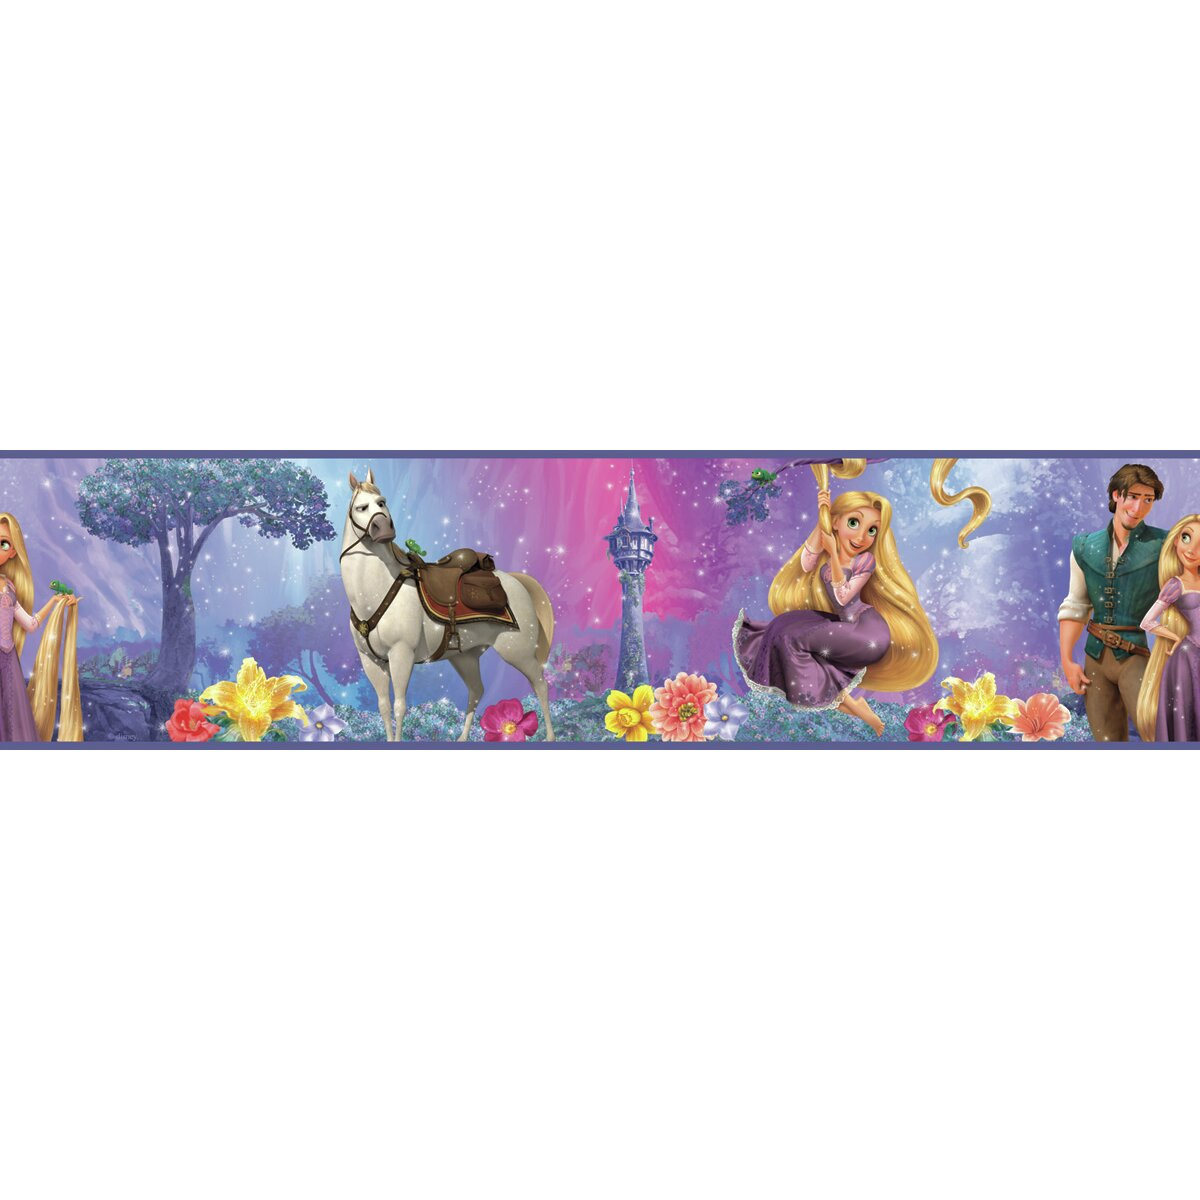 disney tangled rapunzel room makeover wall decal wayfair